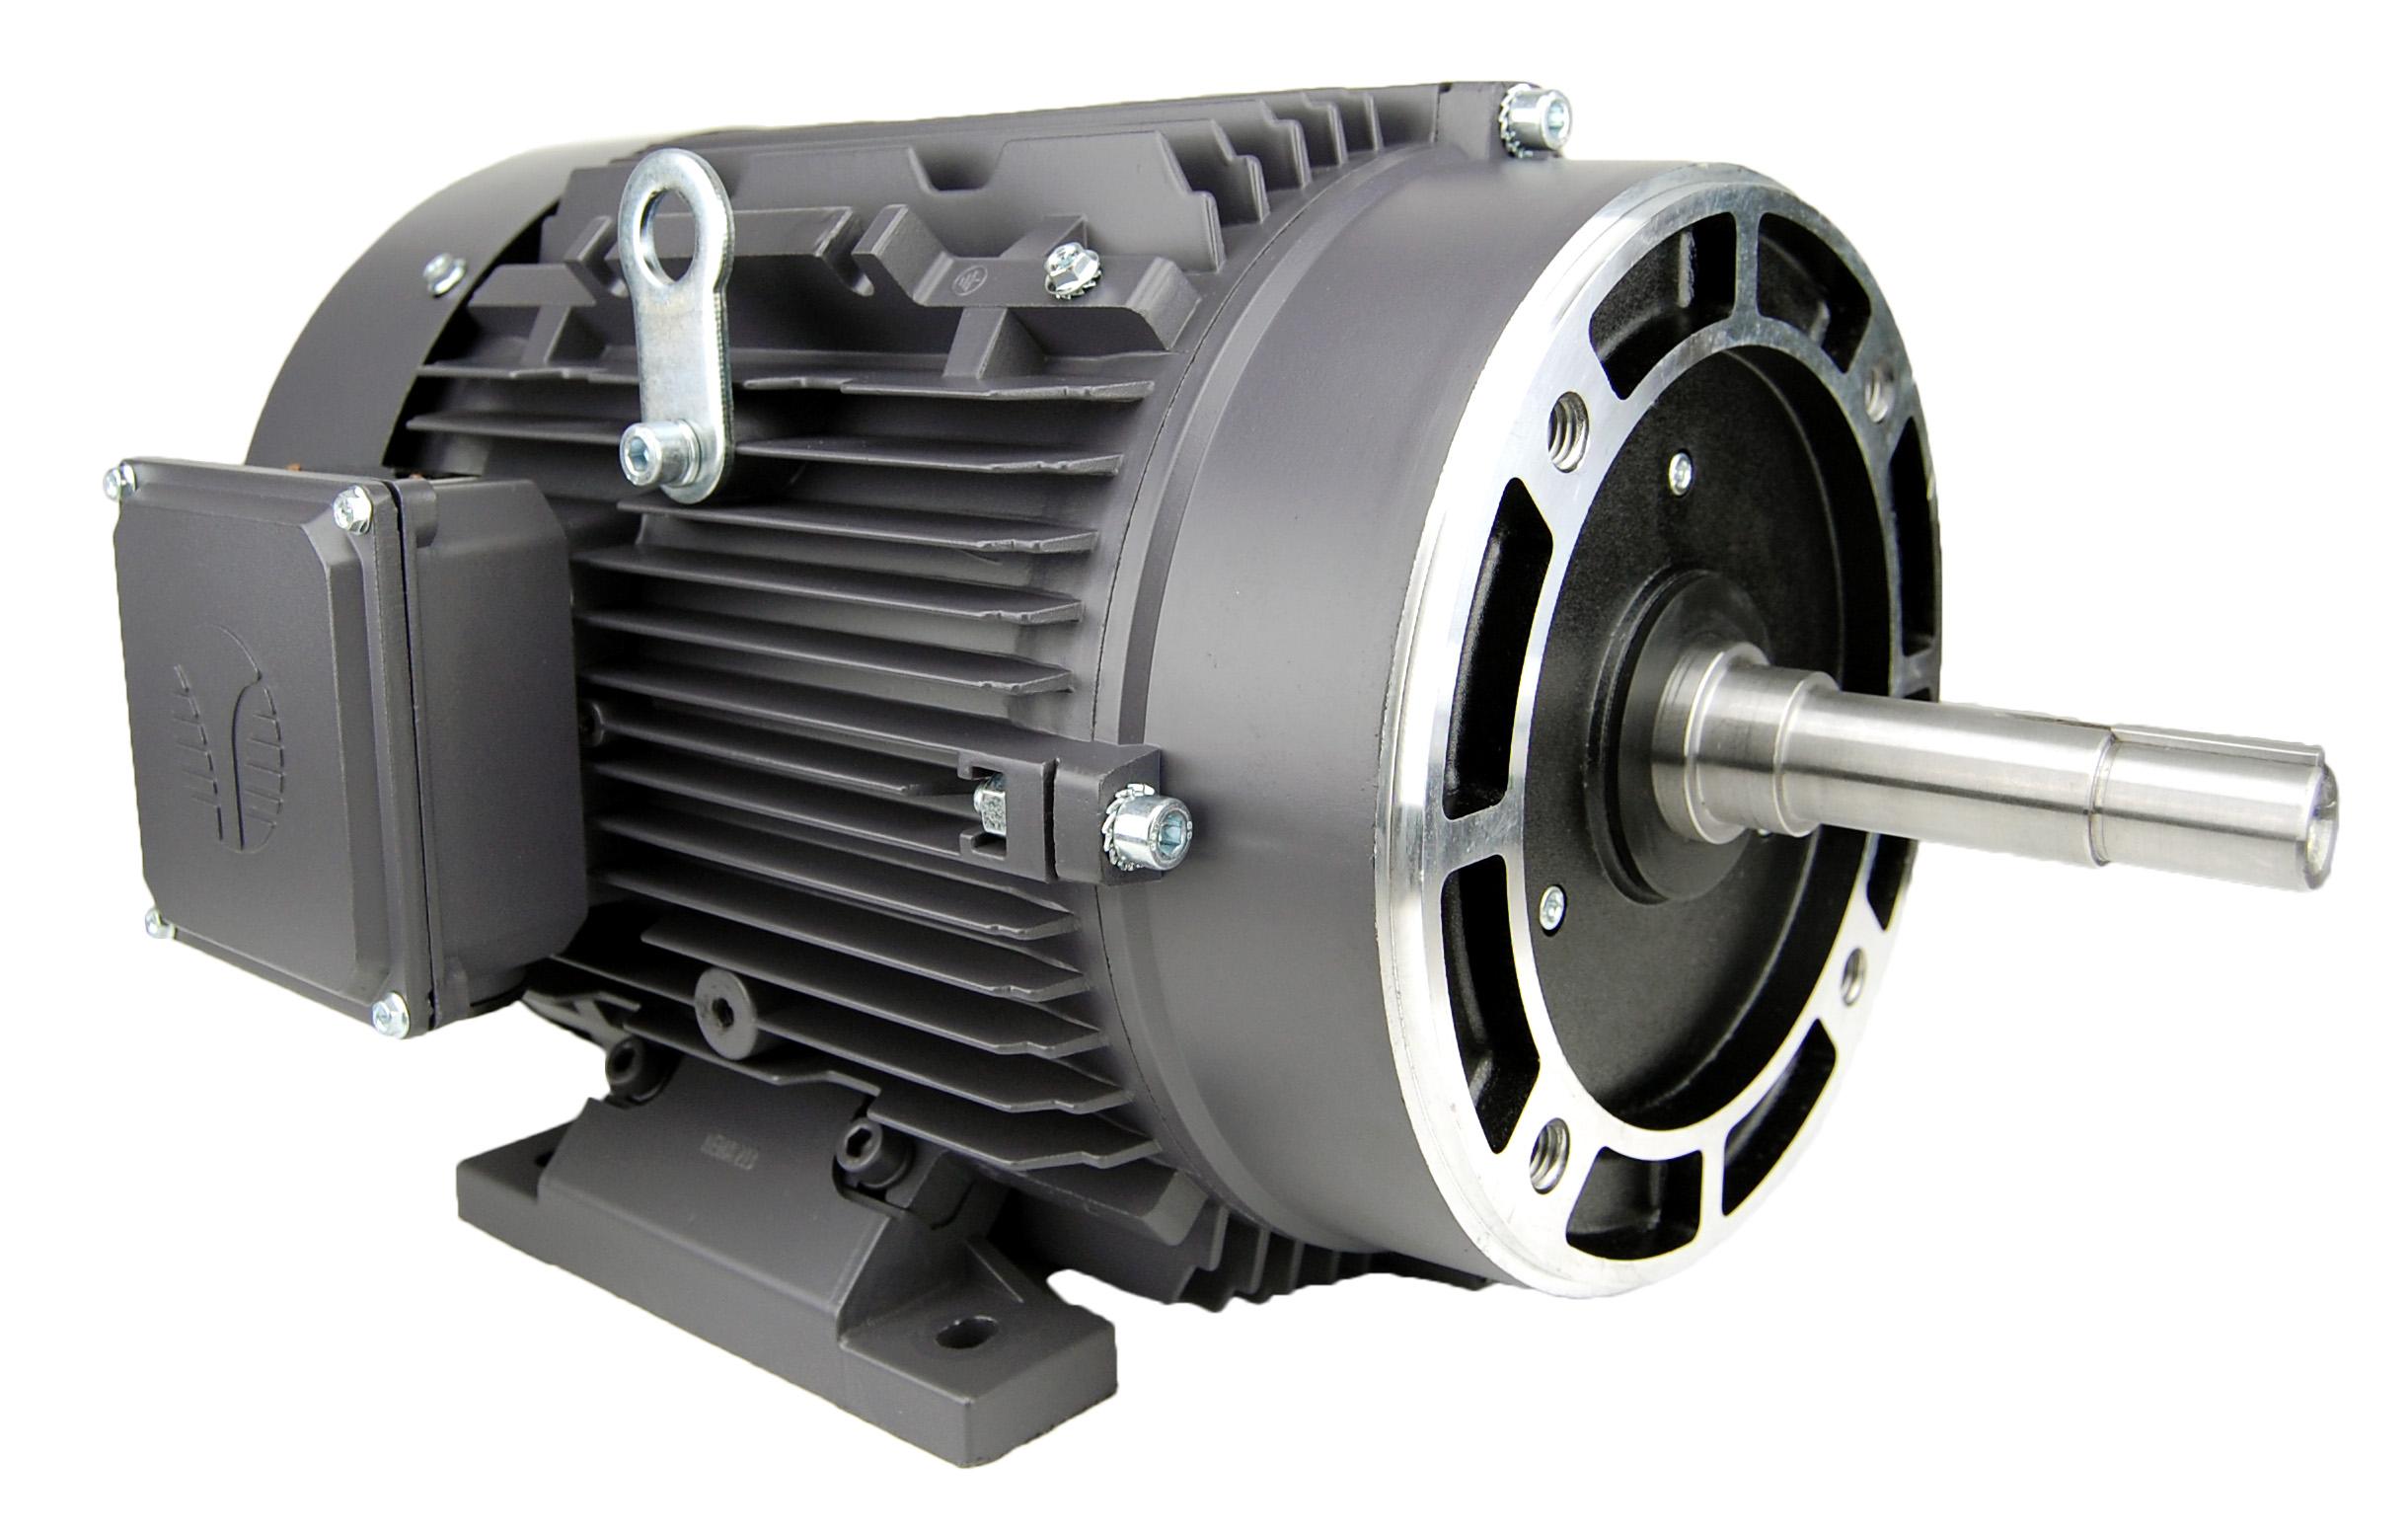 Industrial Motor Repair Warrington Pa Industrial Motor Replacement Warrington Pa 215 672 5250